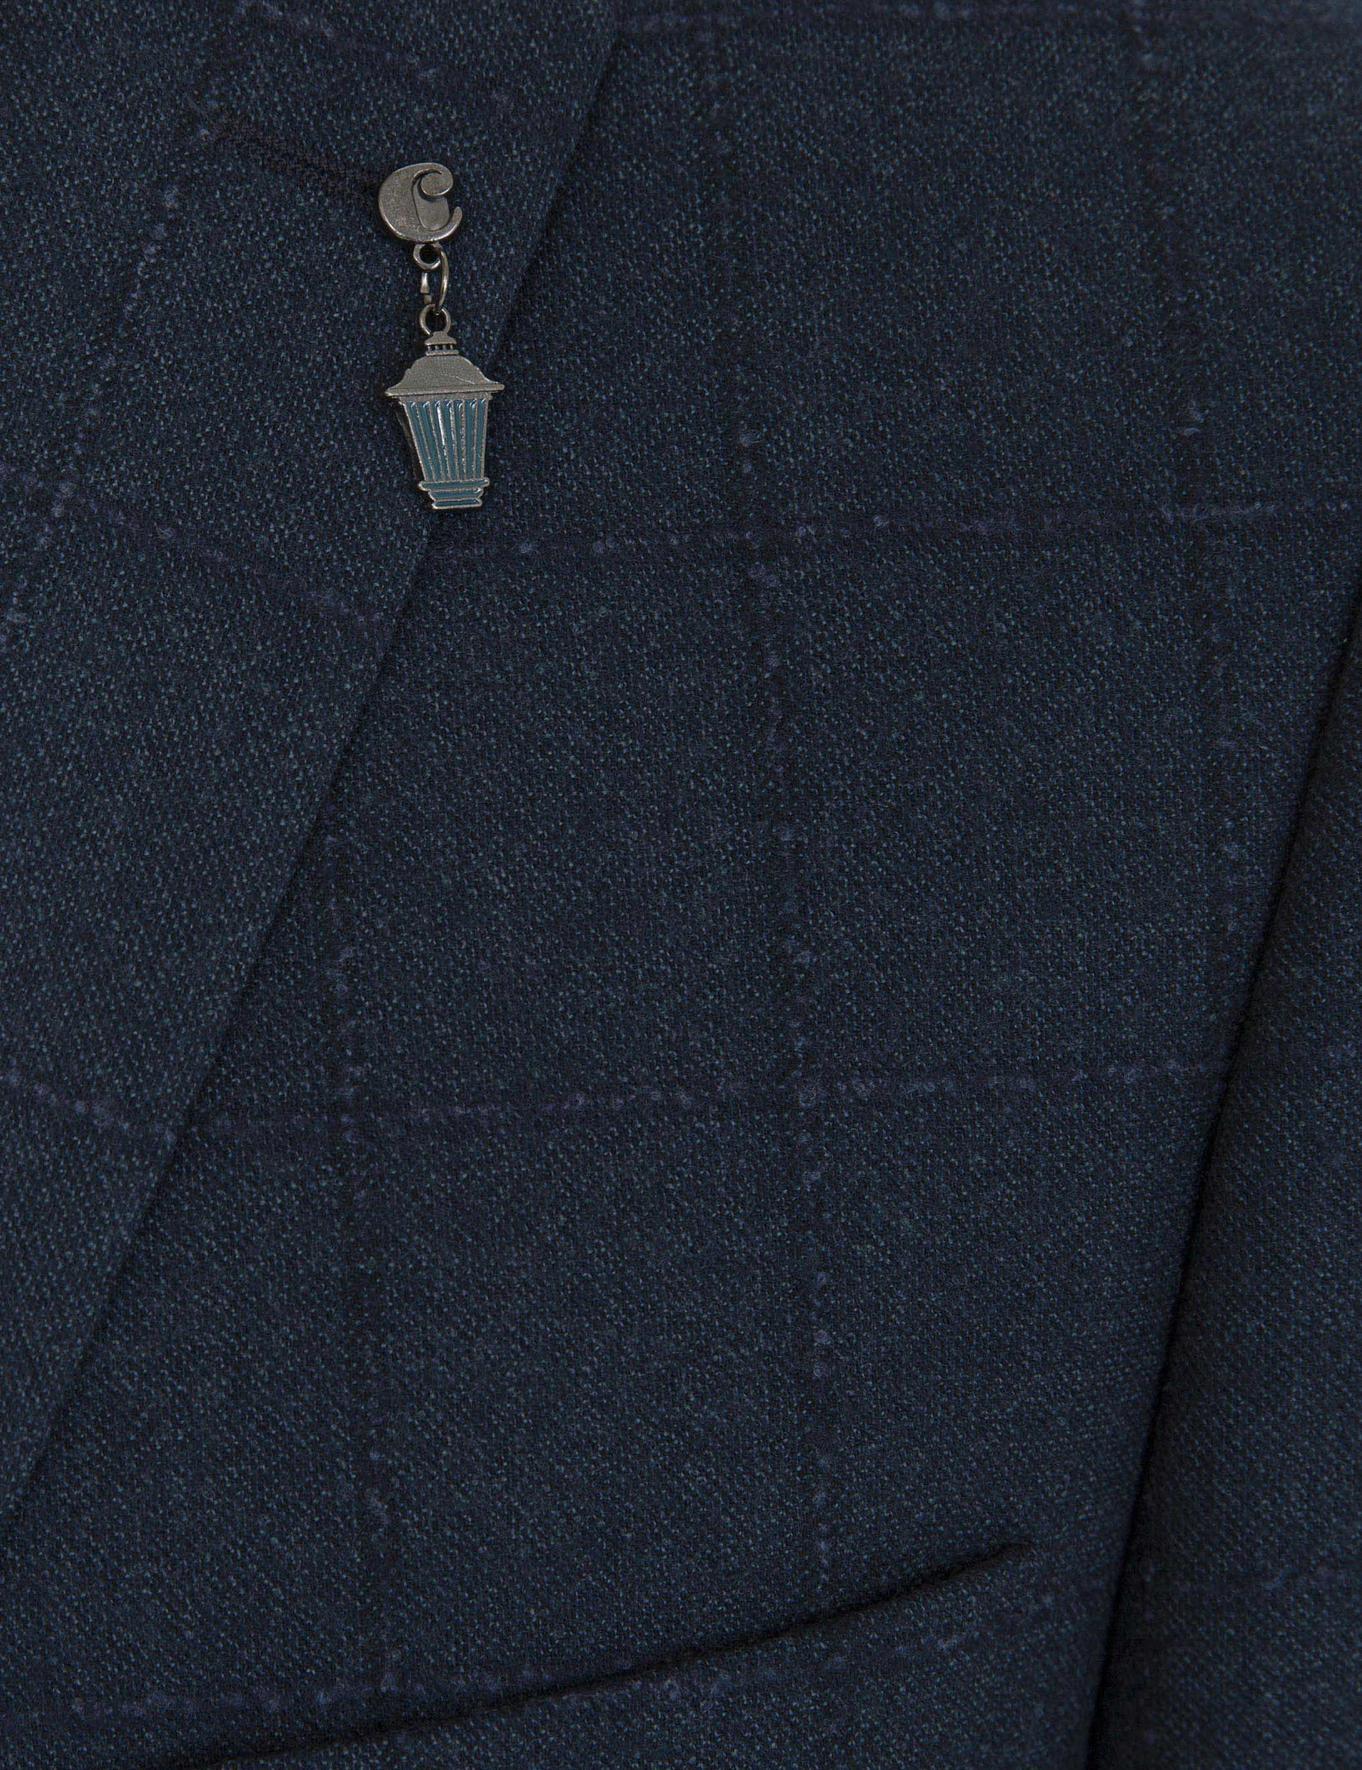 Lacivert Slim Fit Ceket - 50206851020